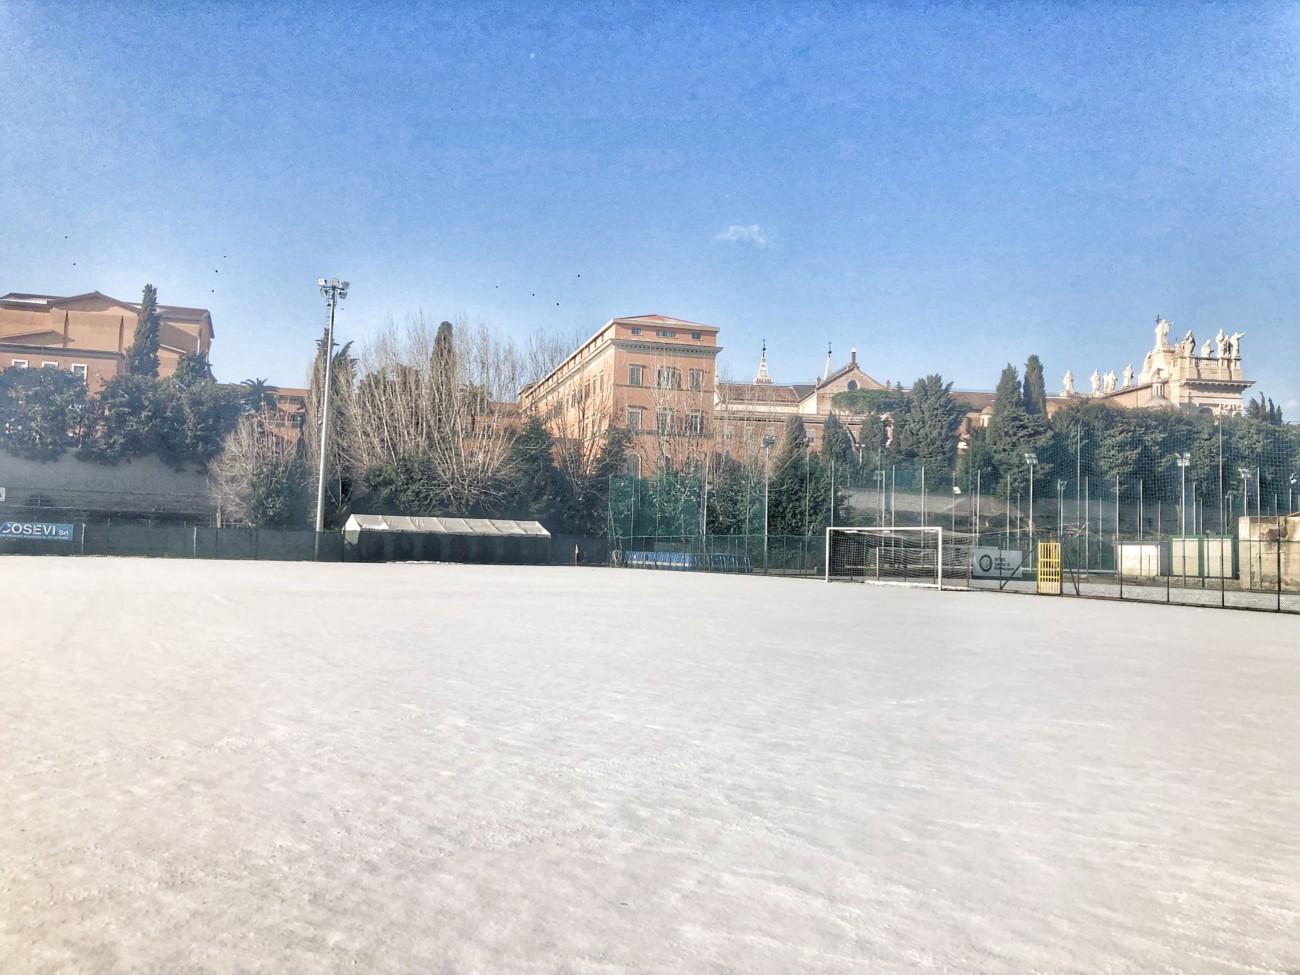 Neve Roma   Attività Regolari 28.02